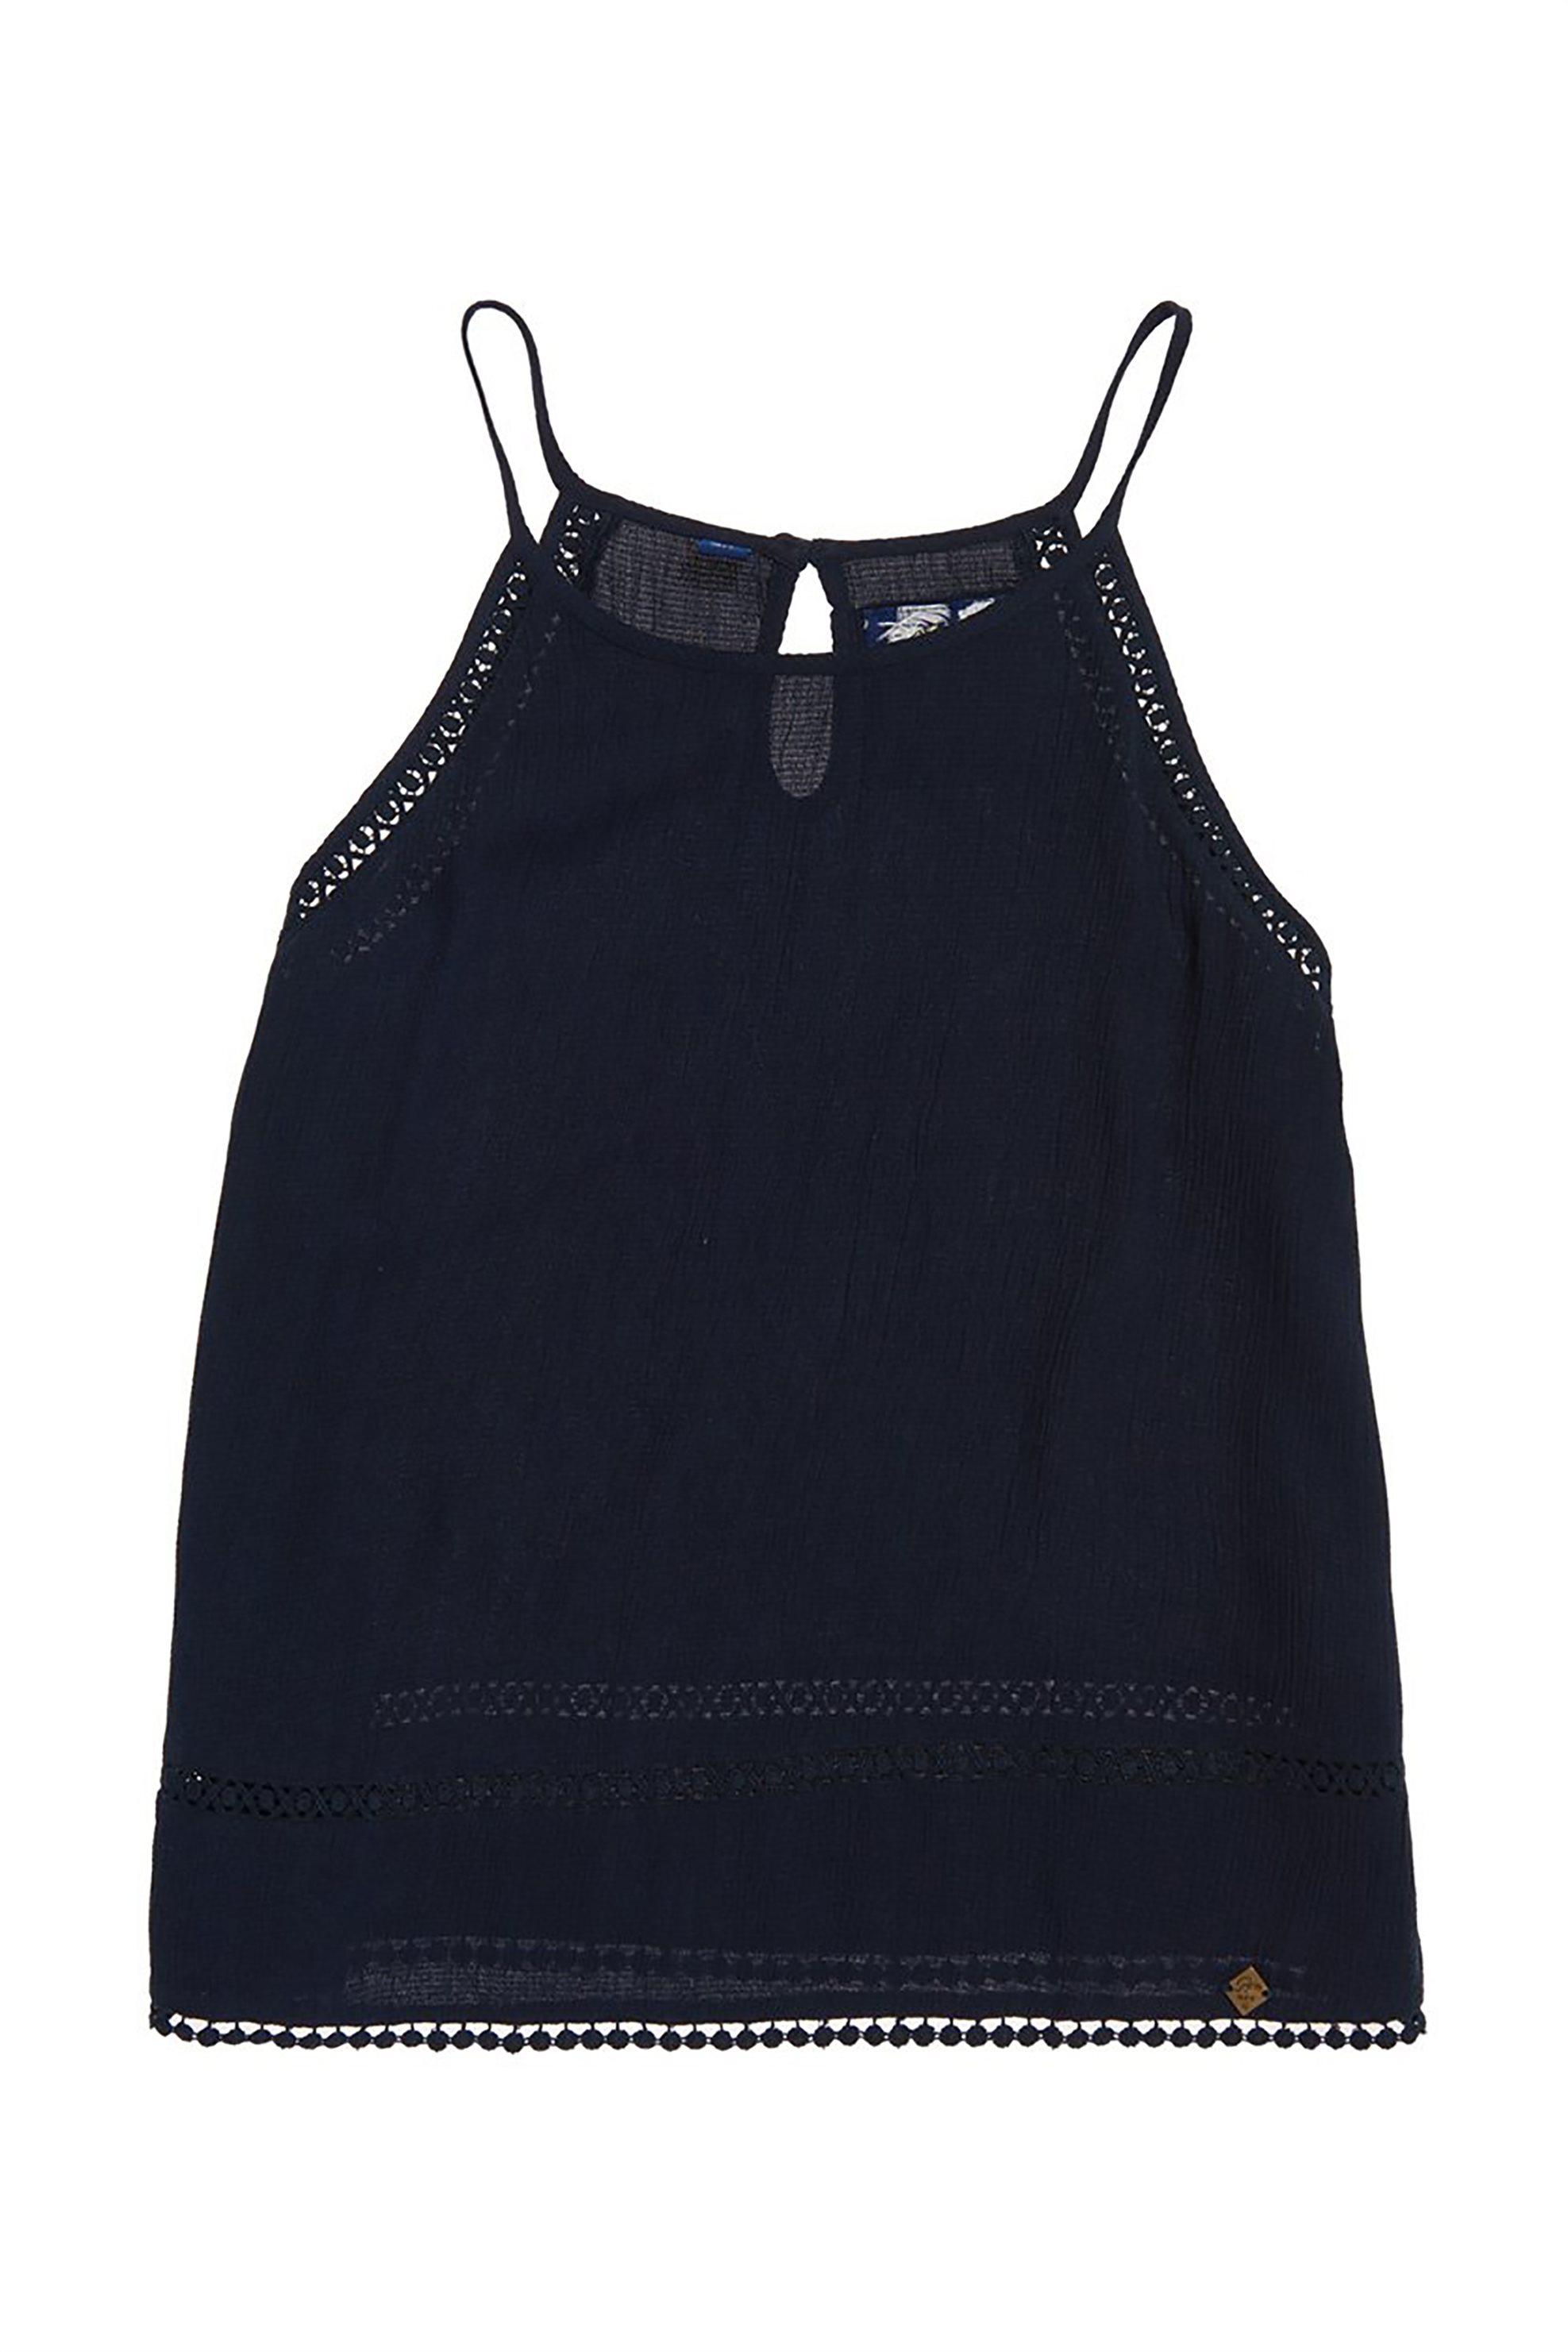 Superdry γυναικεία μπλούζα με λεπτό ραντάκι Ricky - G60101JT - Μπλε Σκούρο γυναικα   ρουχα   tops   ραντάκια   κορμάκια   μπλούζες   casual